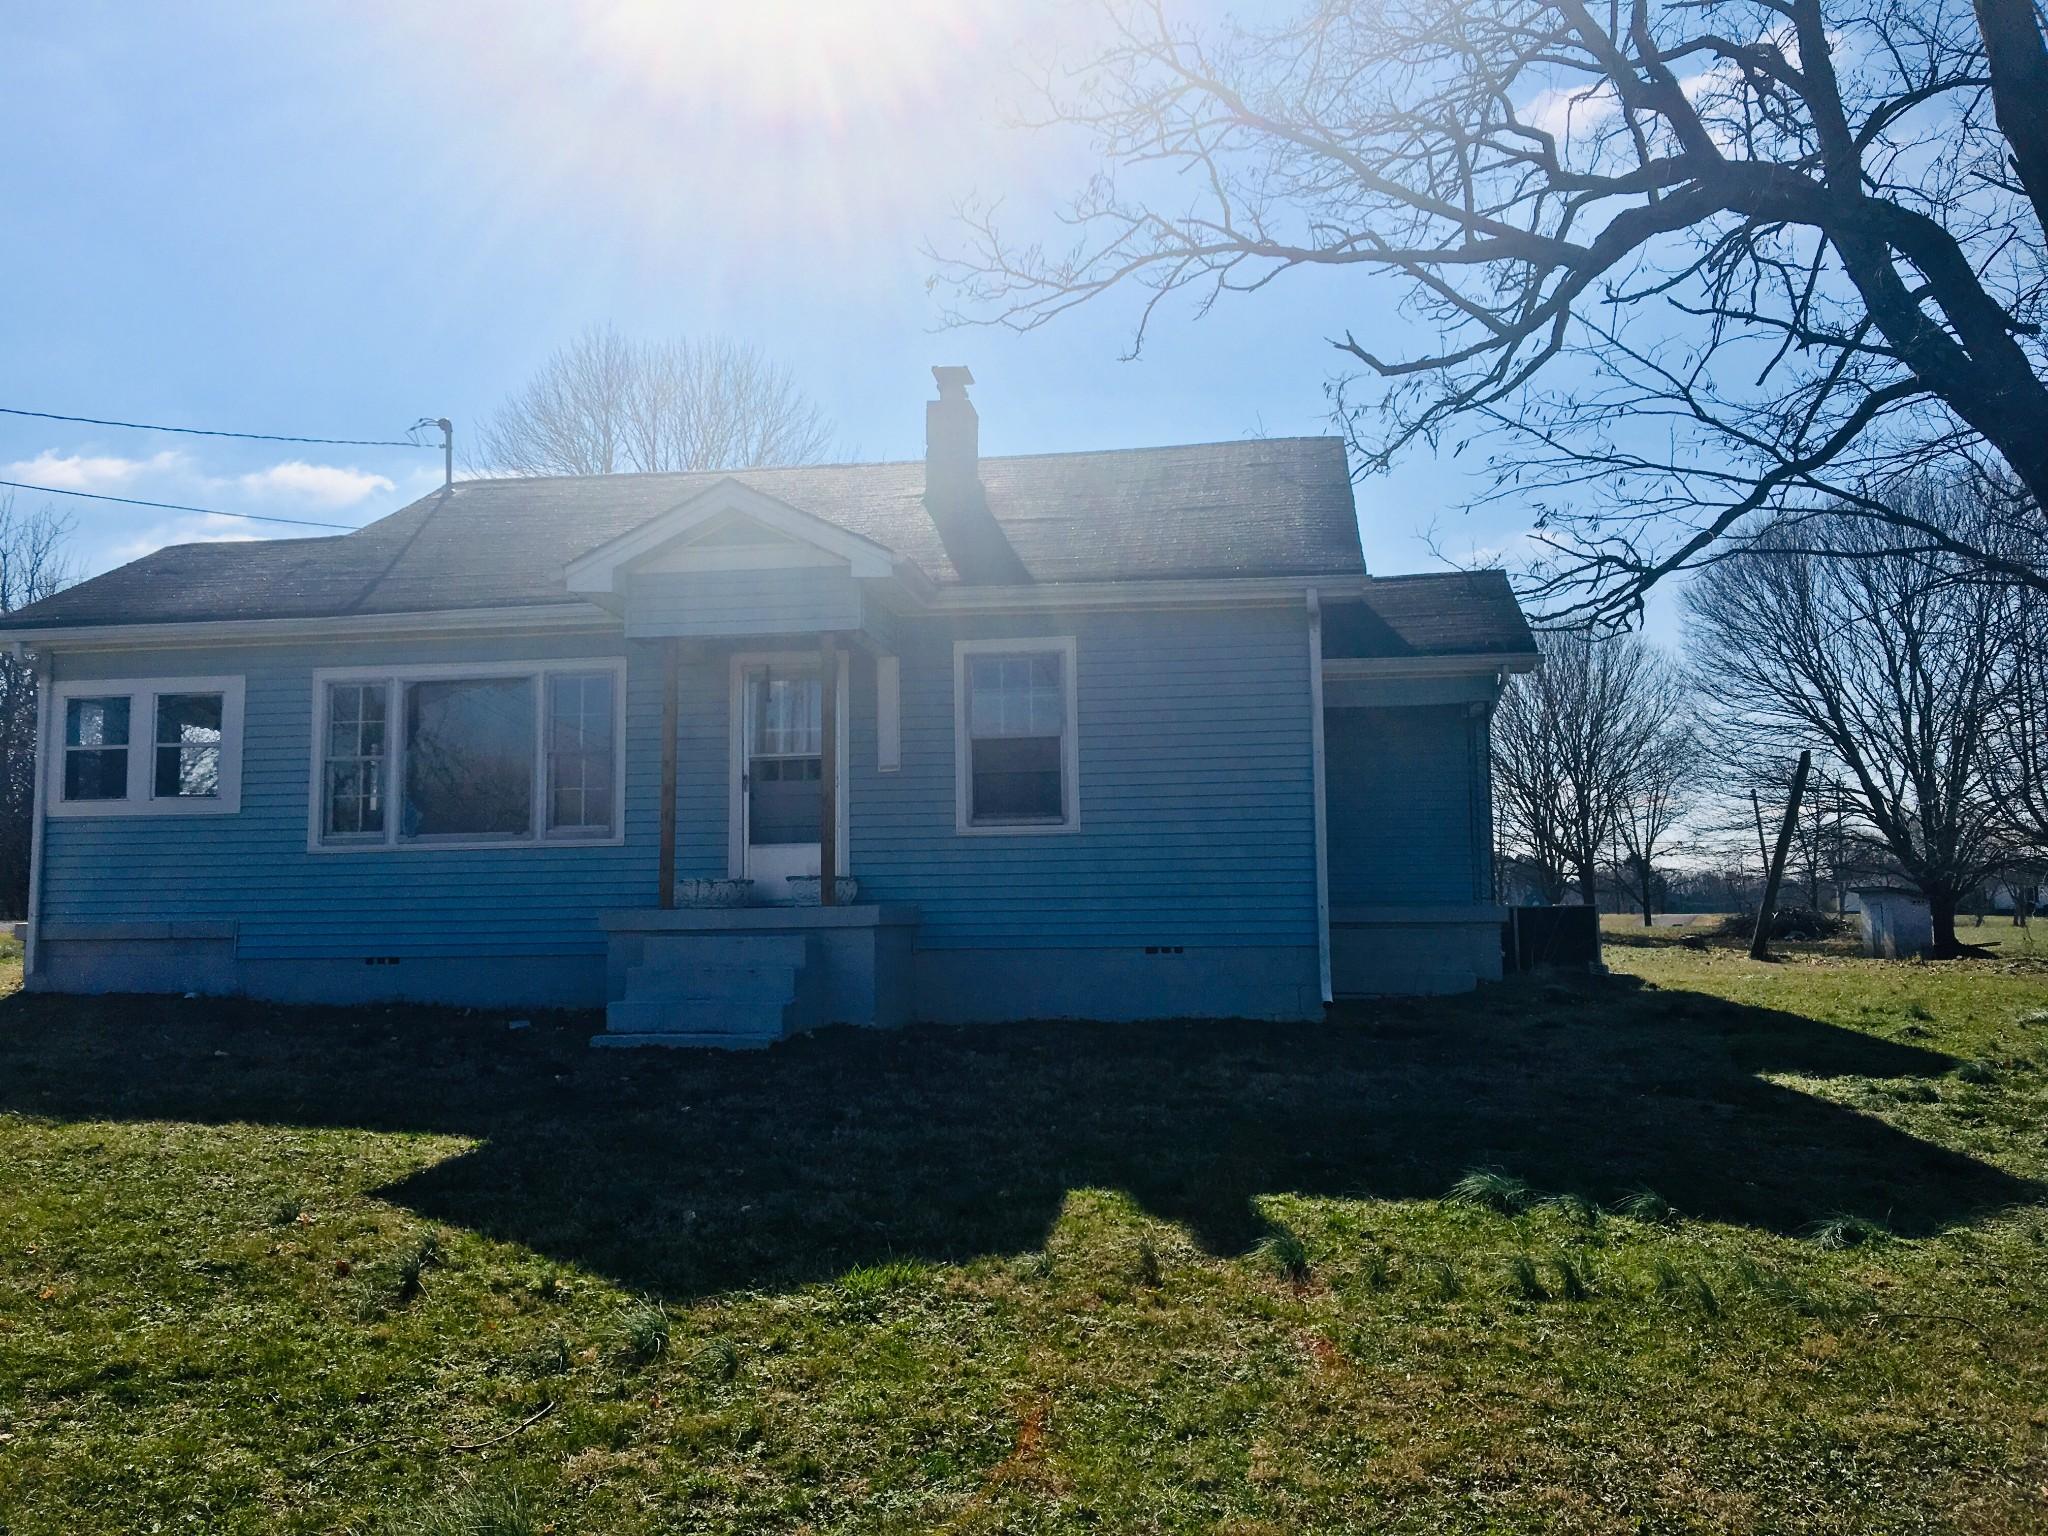 3929 Old Clarksville Pike, Joelton, TN 37080 - Joelton, TN real estate listing